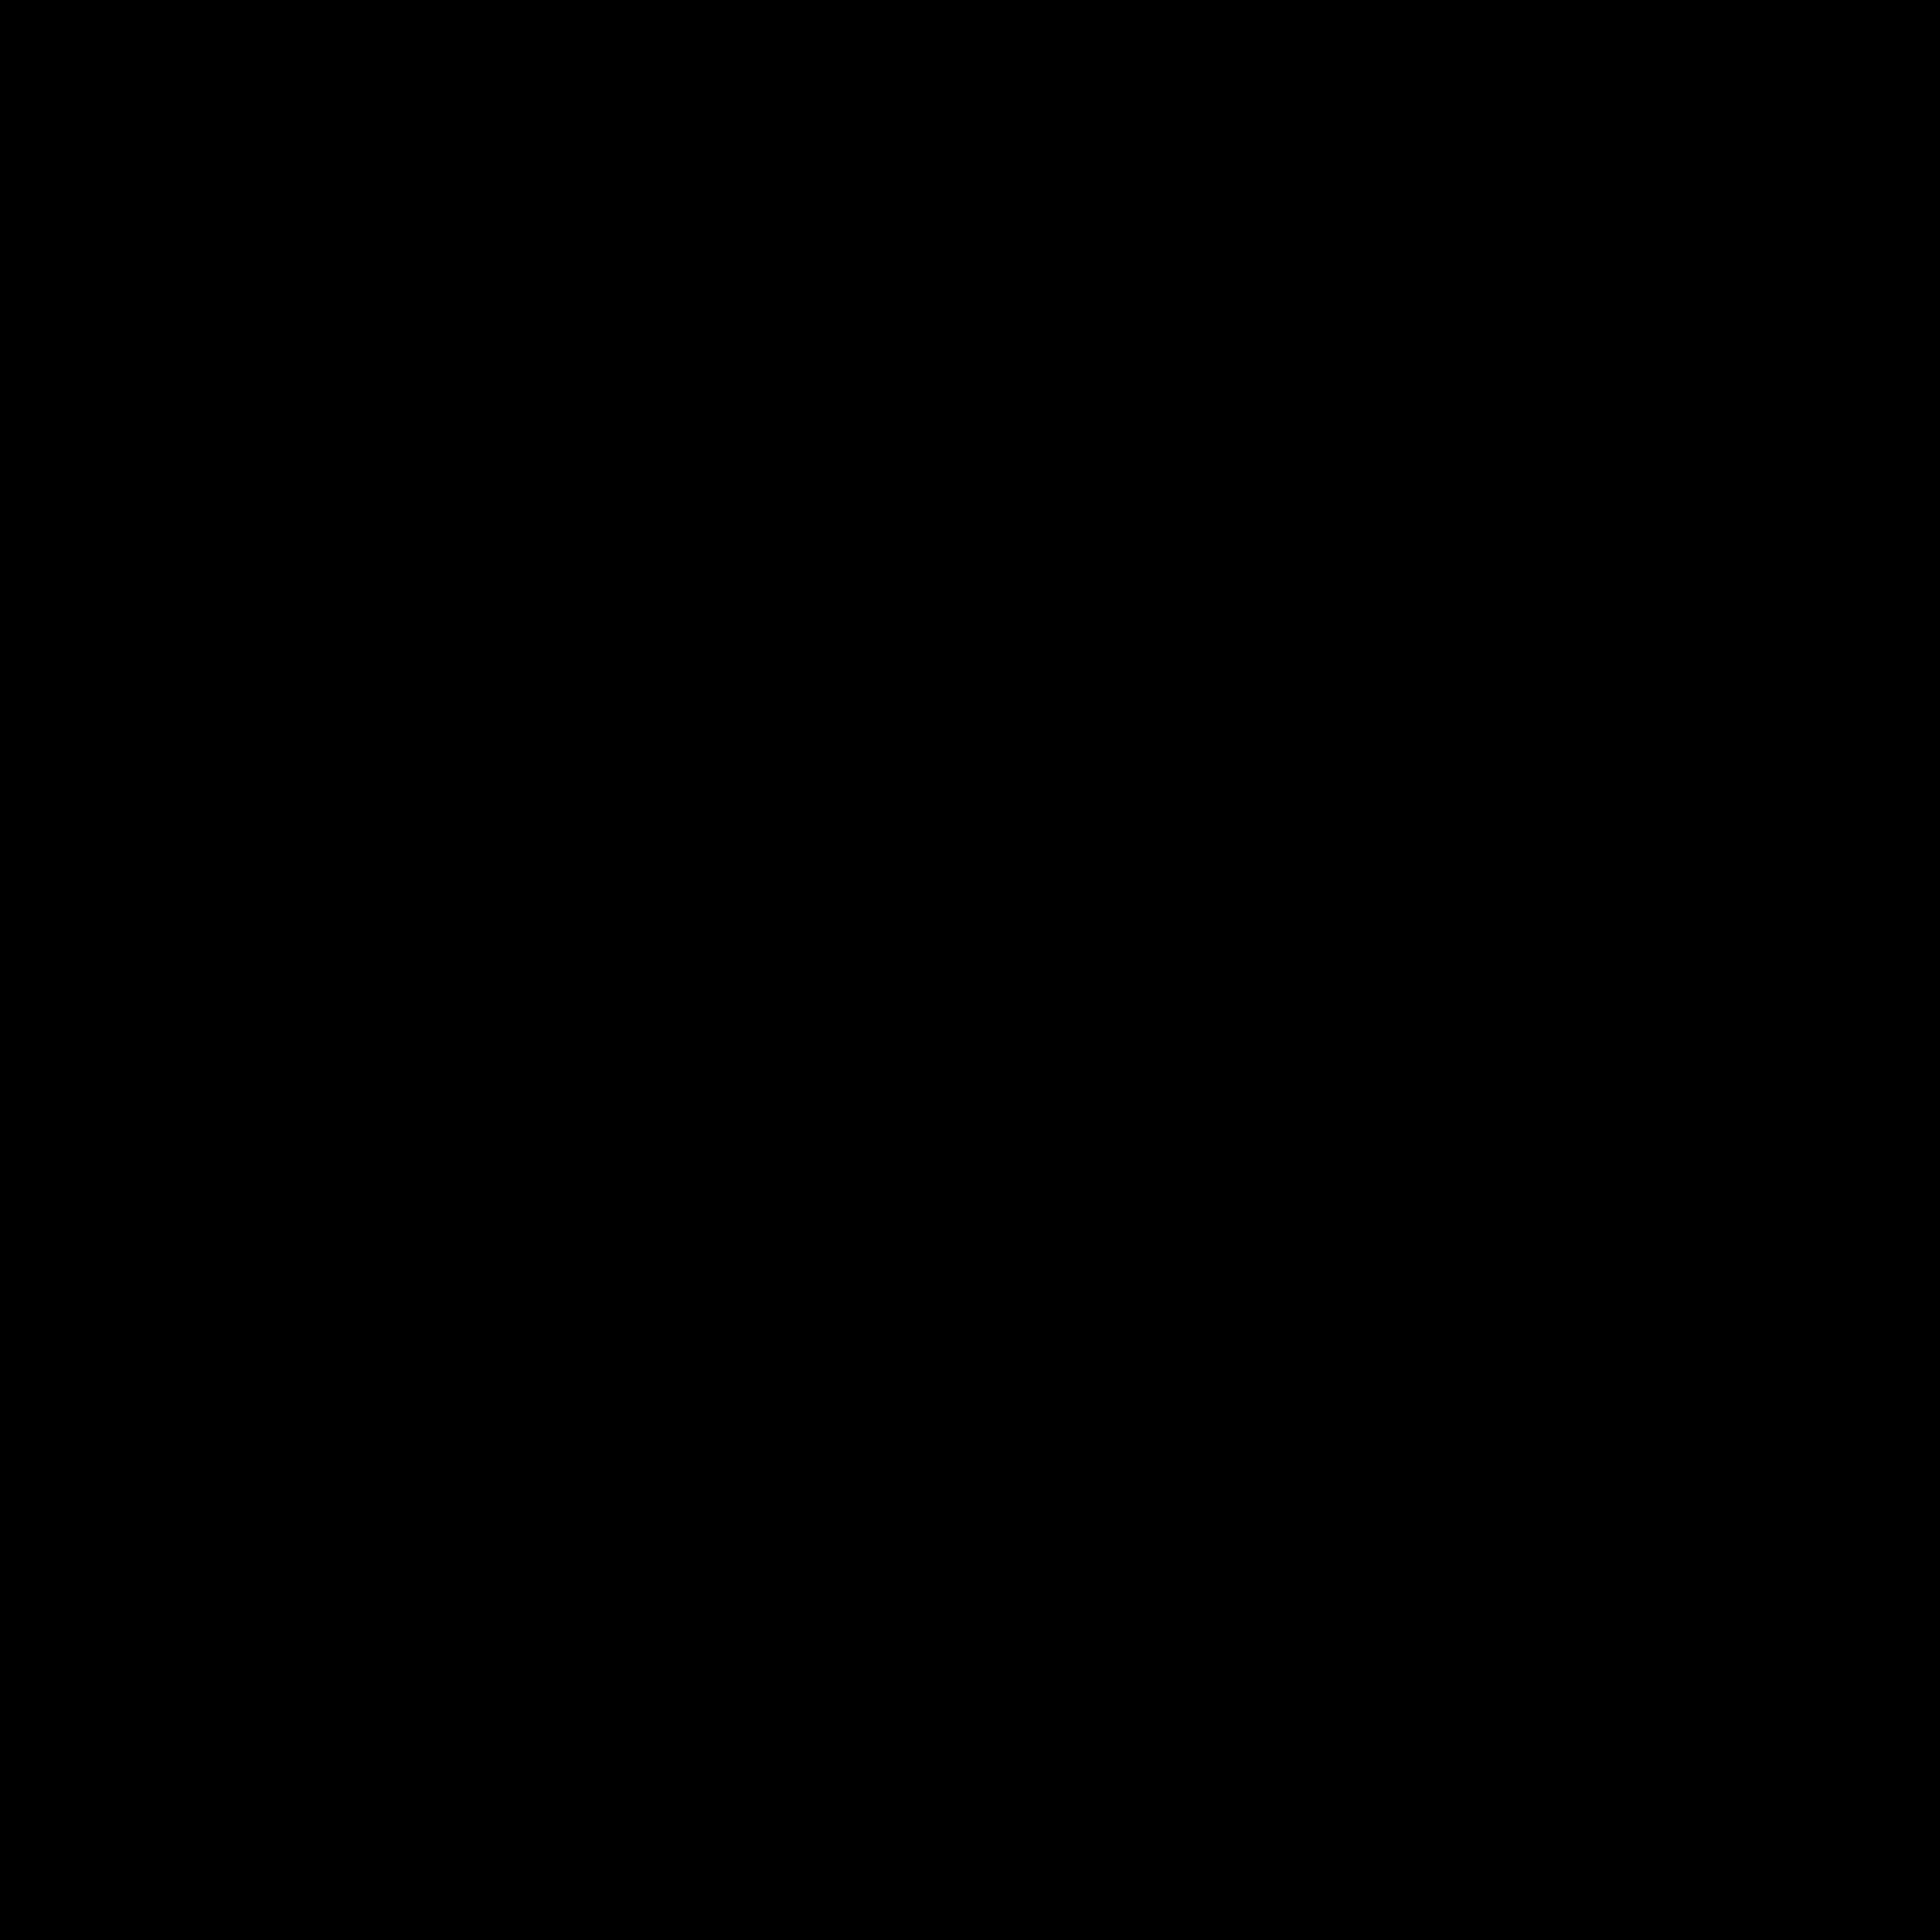 IFC Logo PNG Transparent & SVG Vector.